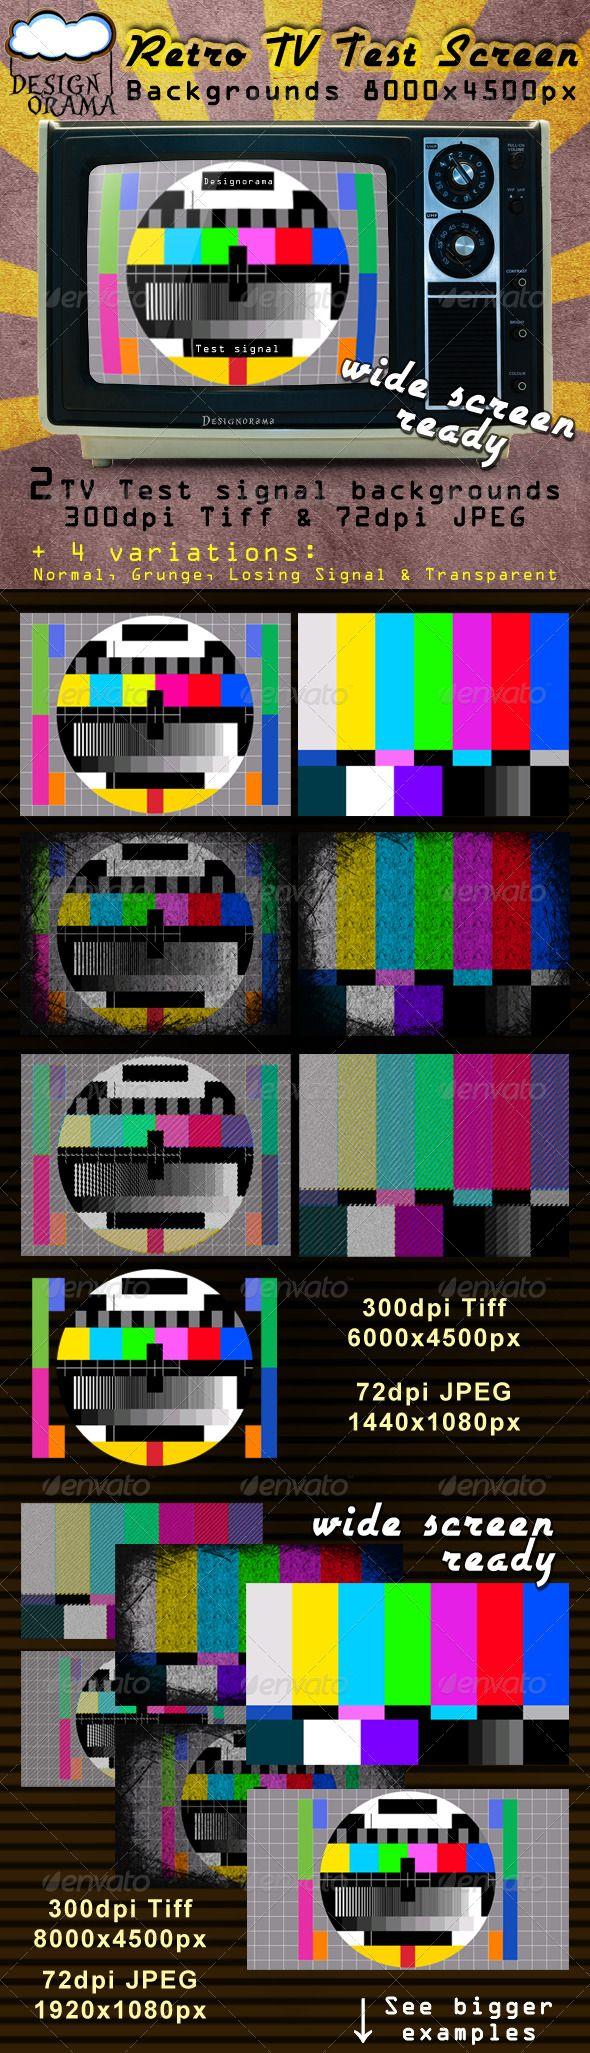 Retro tv test screen 3 00